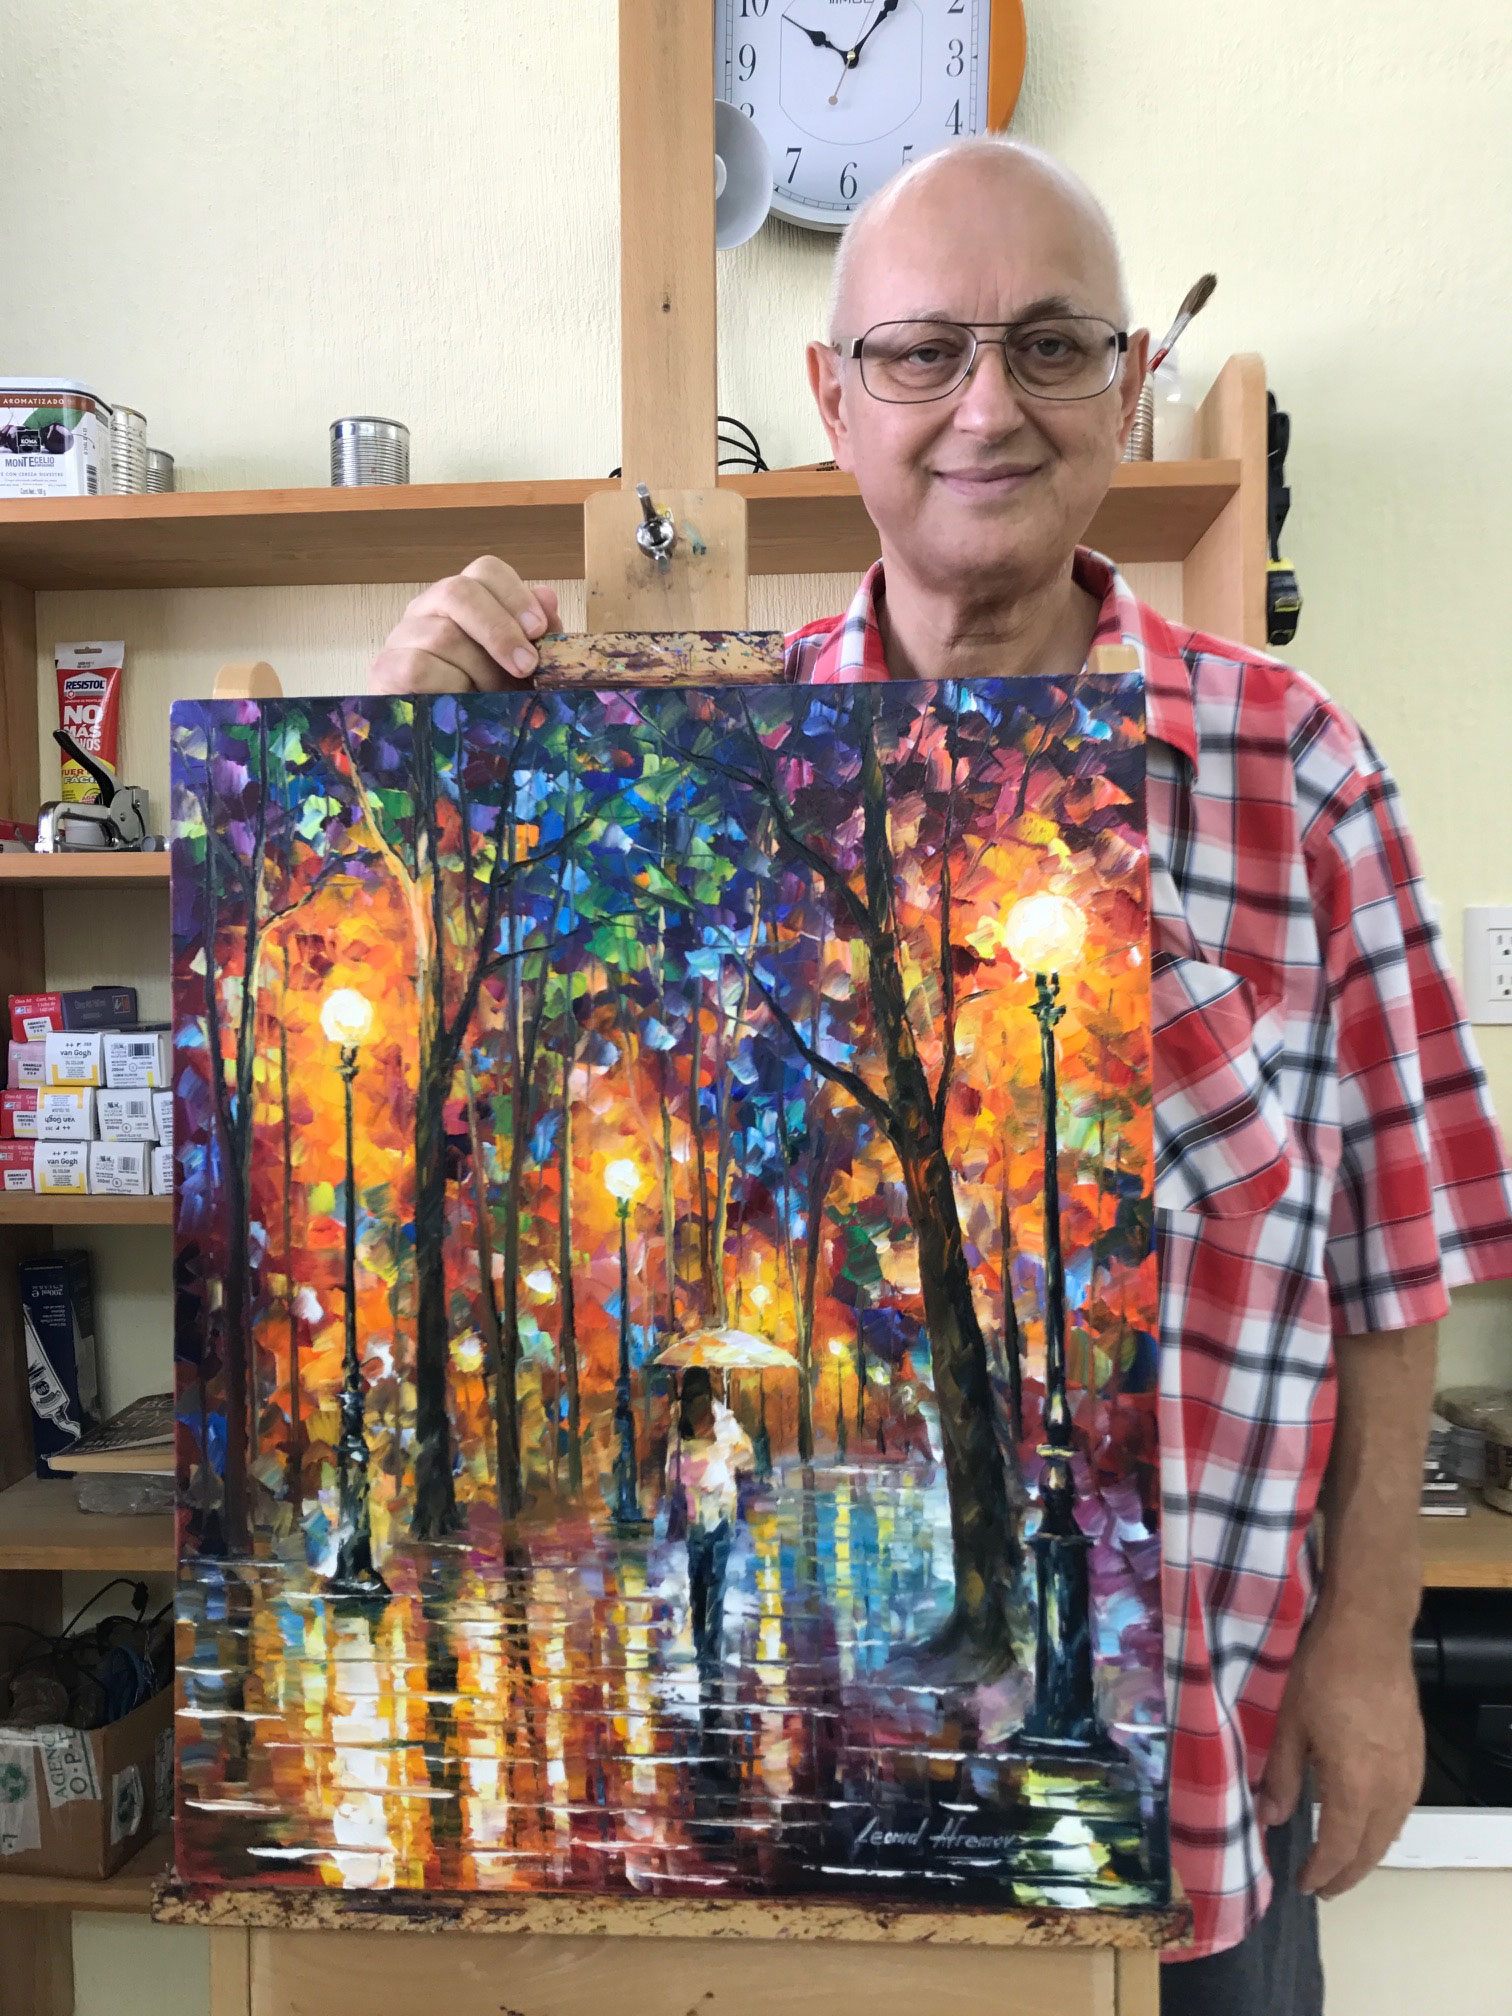 L'artiste devant sa peinture